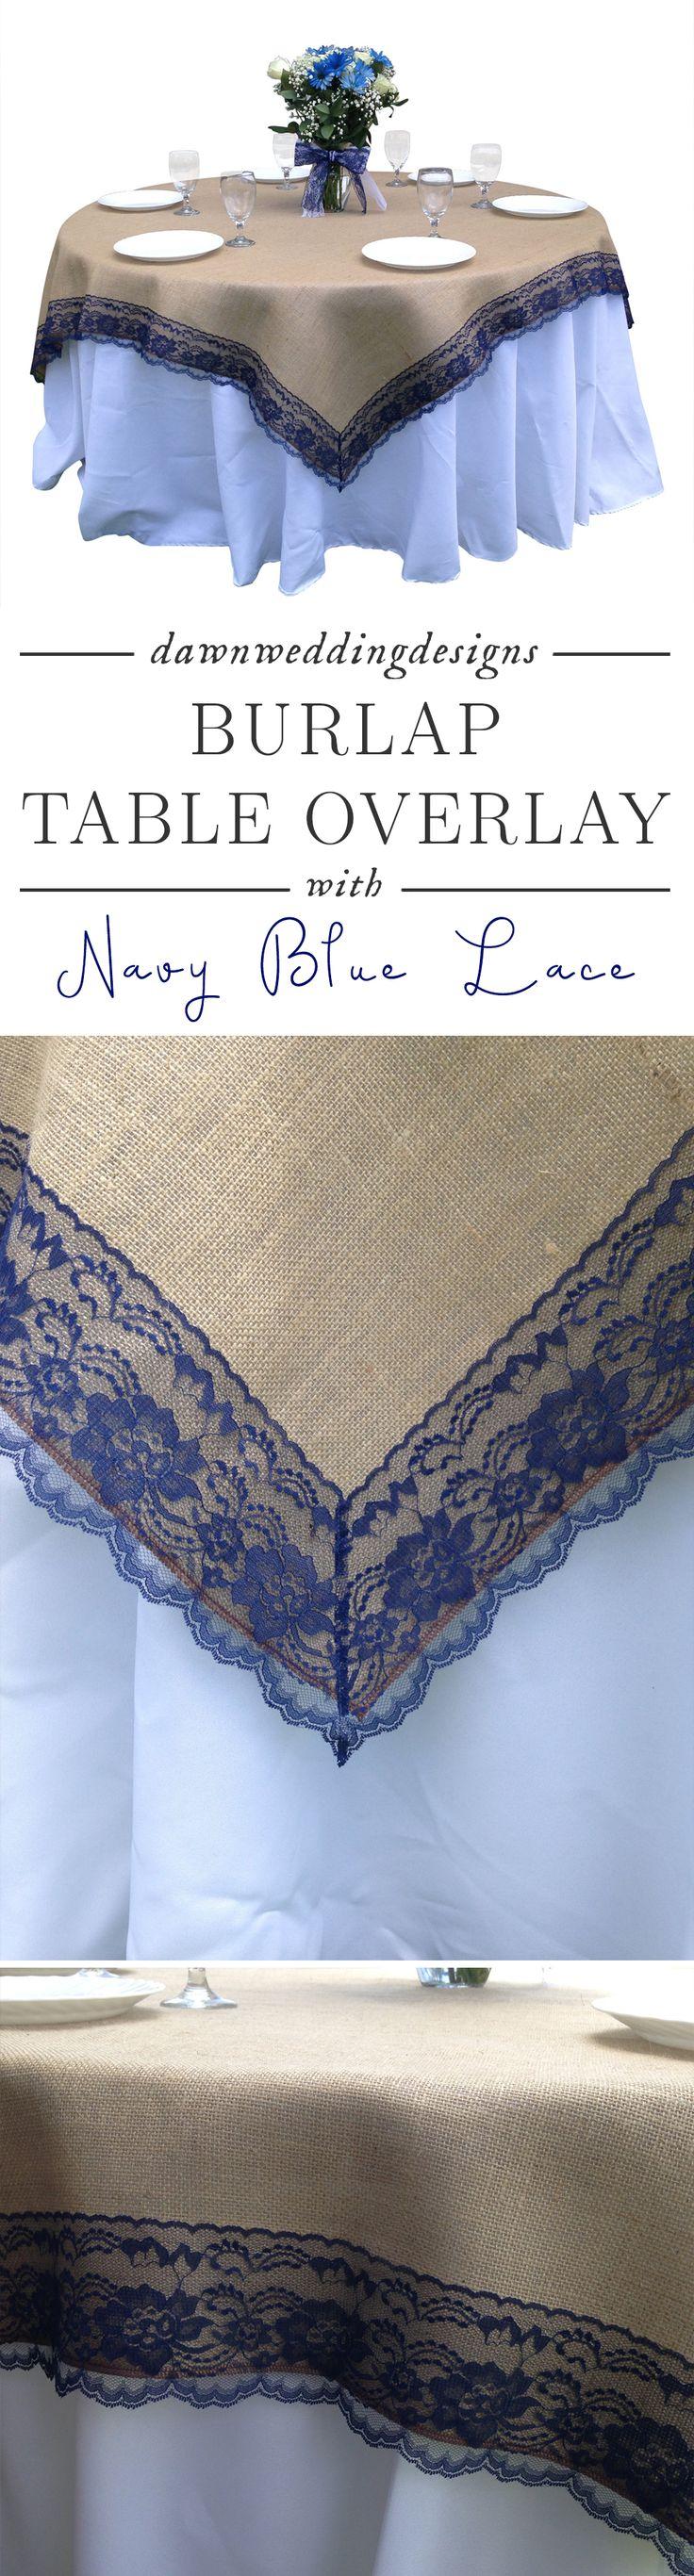 Navy Blue Rustic Wedding Décor  Burlap NAVY/DARK BLUE Lace-Edged Table Overlay / Tablecloth- Rustic Country Home Decor Table Linen, Wedding Reception Decor